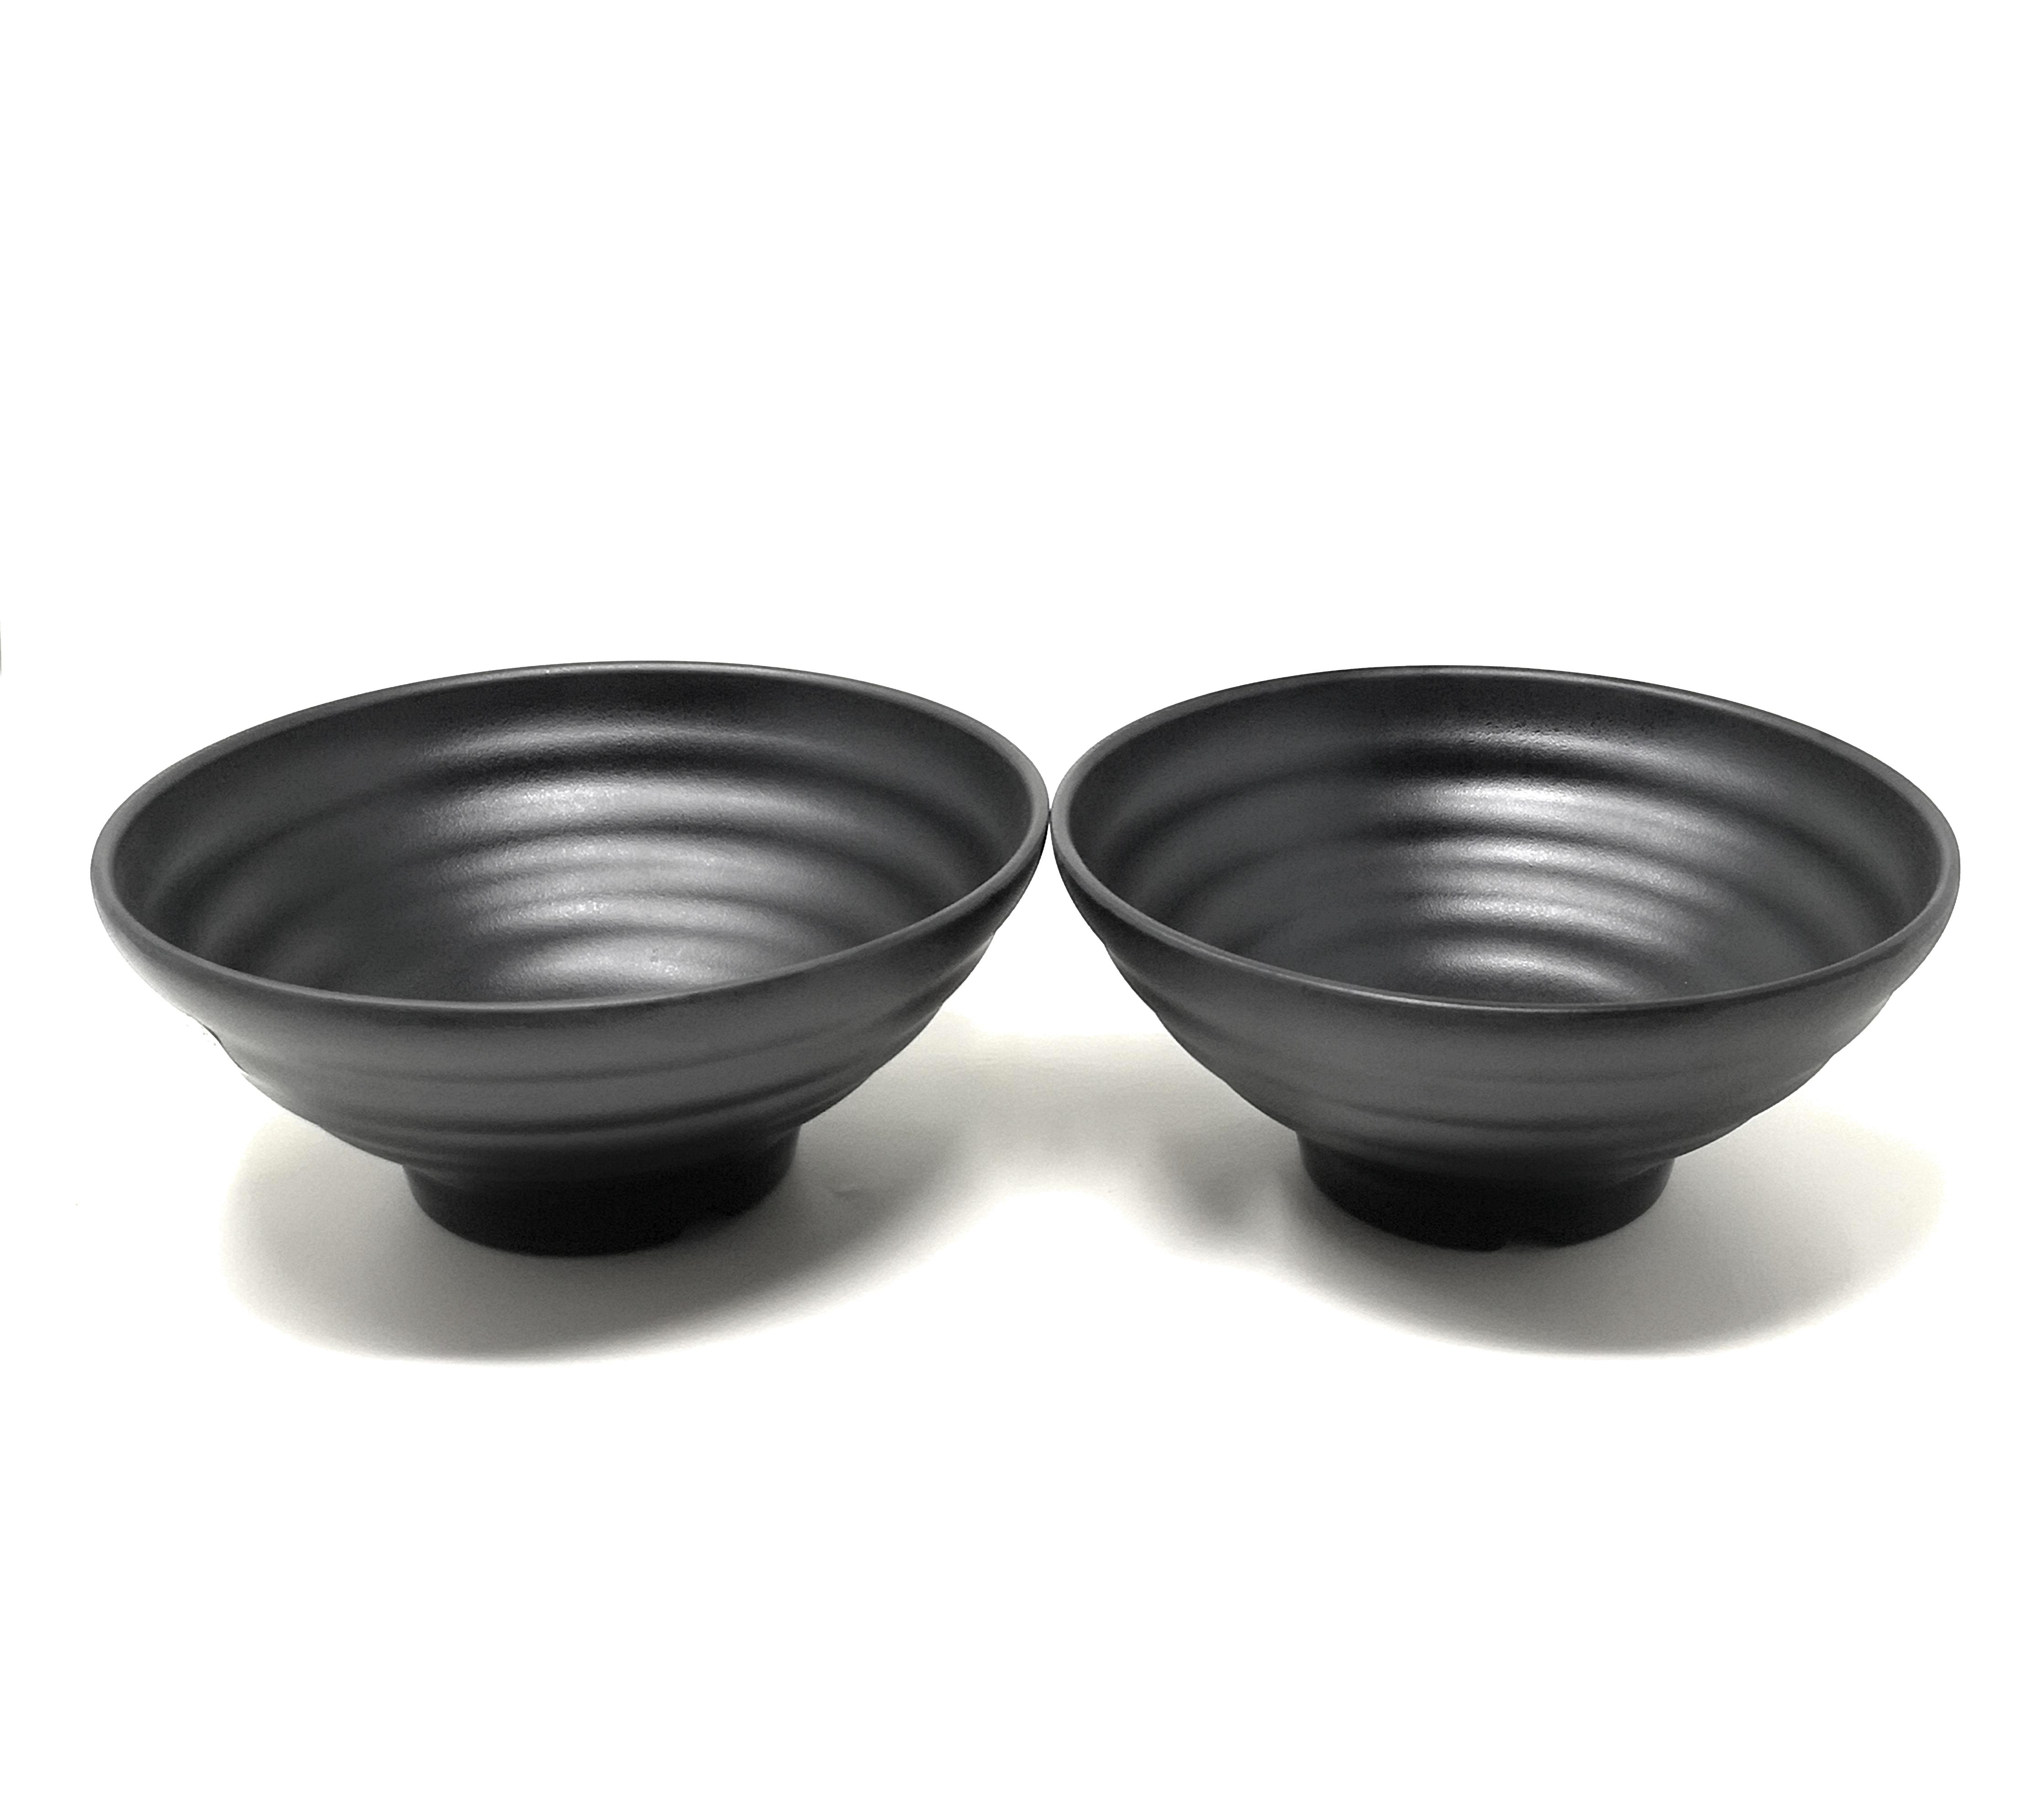 60 Ounce Large Melamine Japanese Ramen Noodle Soup Bowl Hard Plastic Dishware For Udon Soba Pho Asian Noodles 8 66 X 4 33 2 Bowls